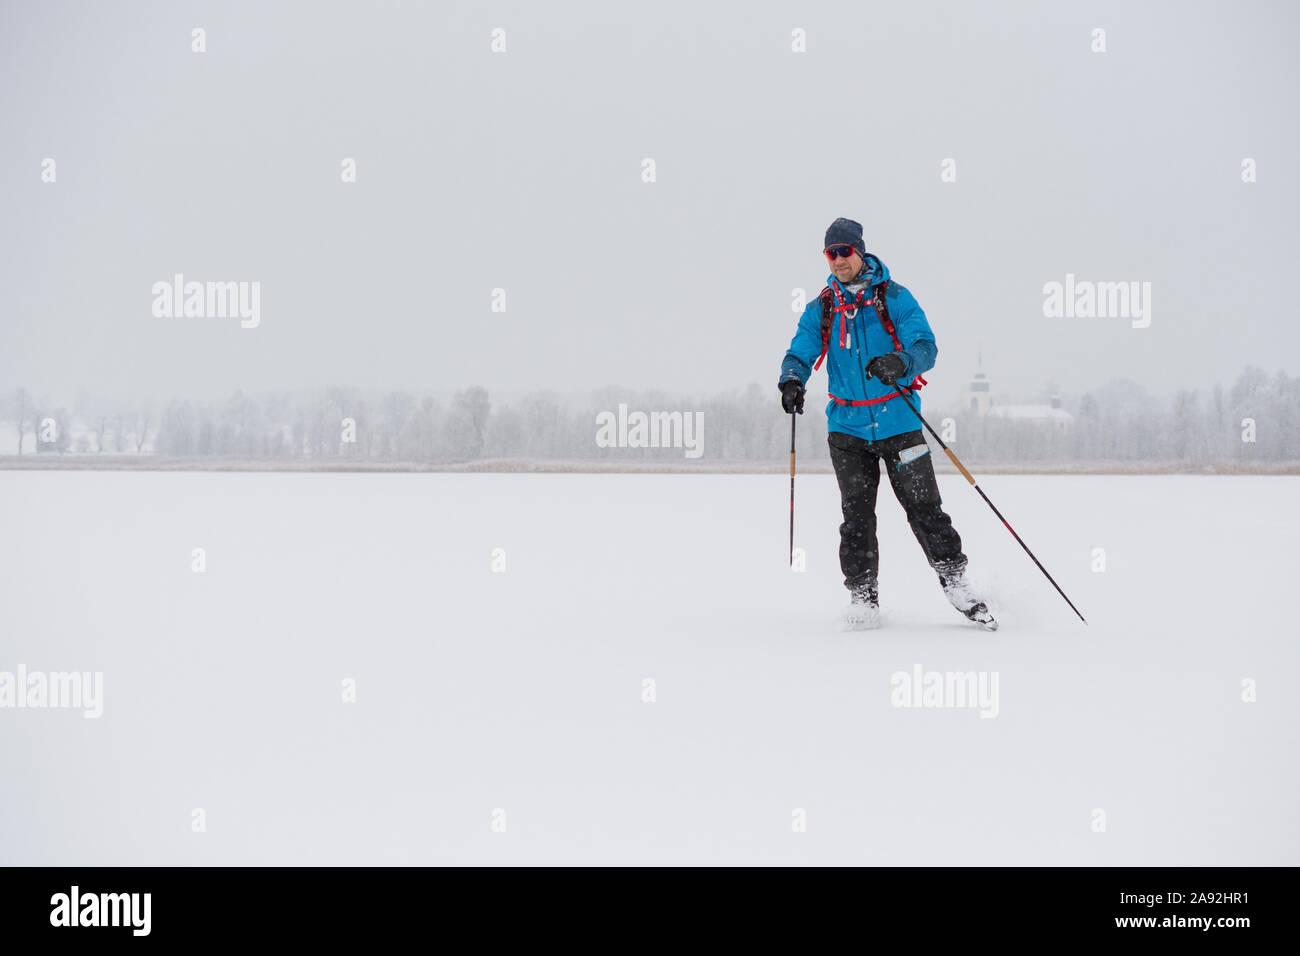 Man ice-skating on frozen lake Stock Photo